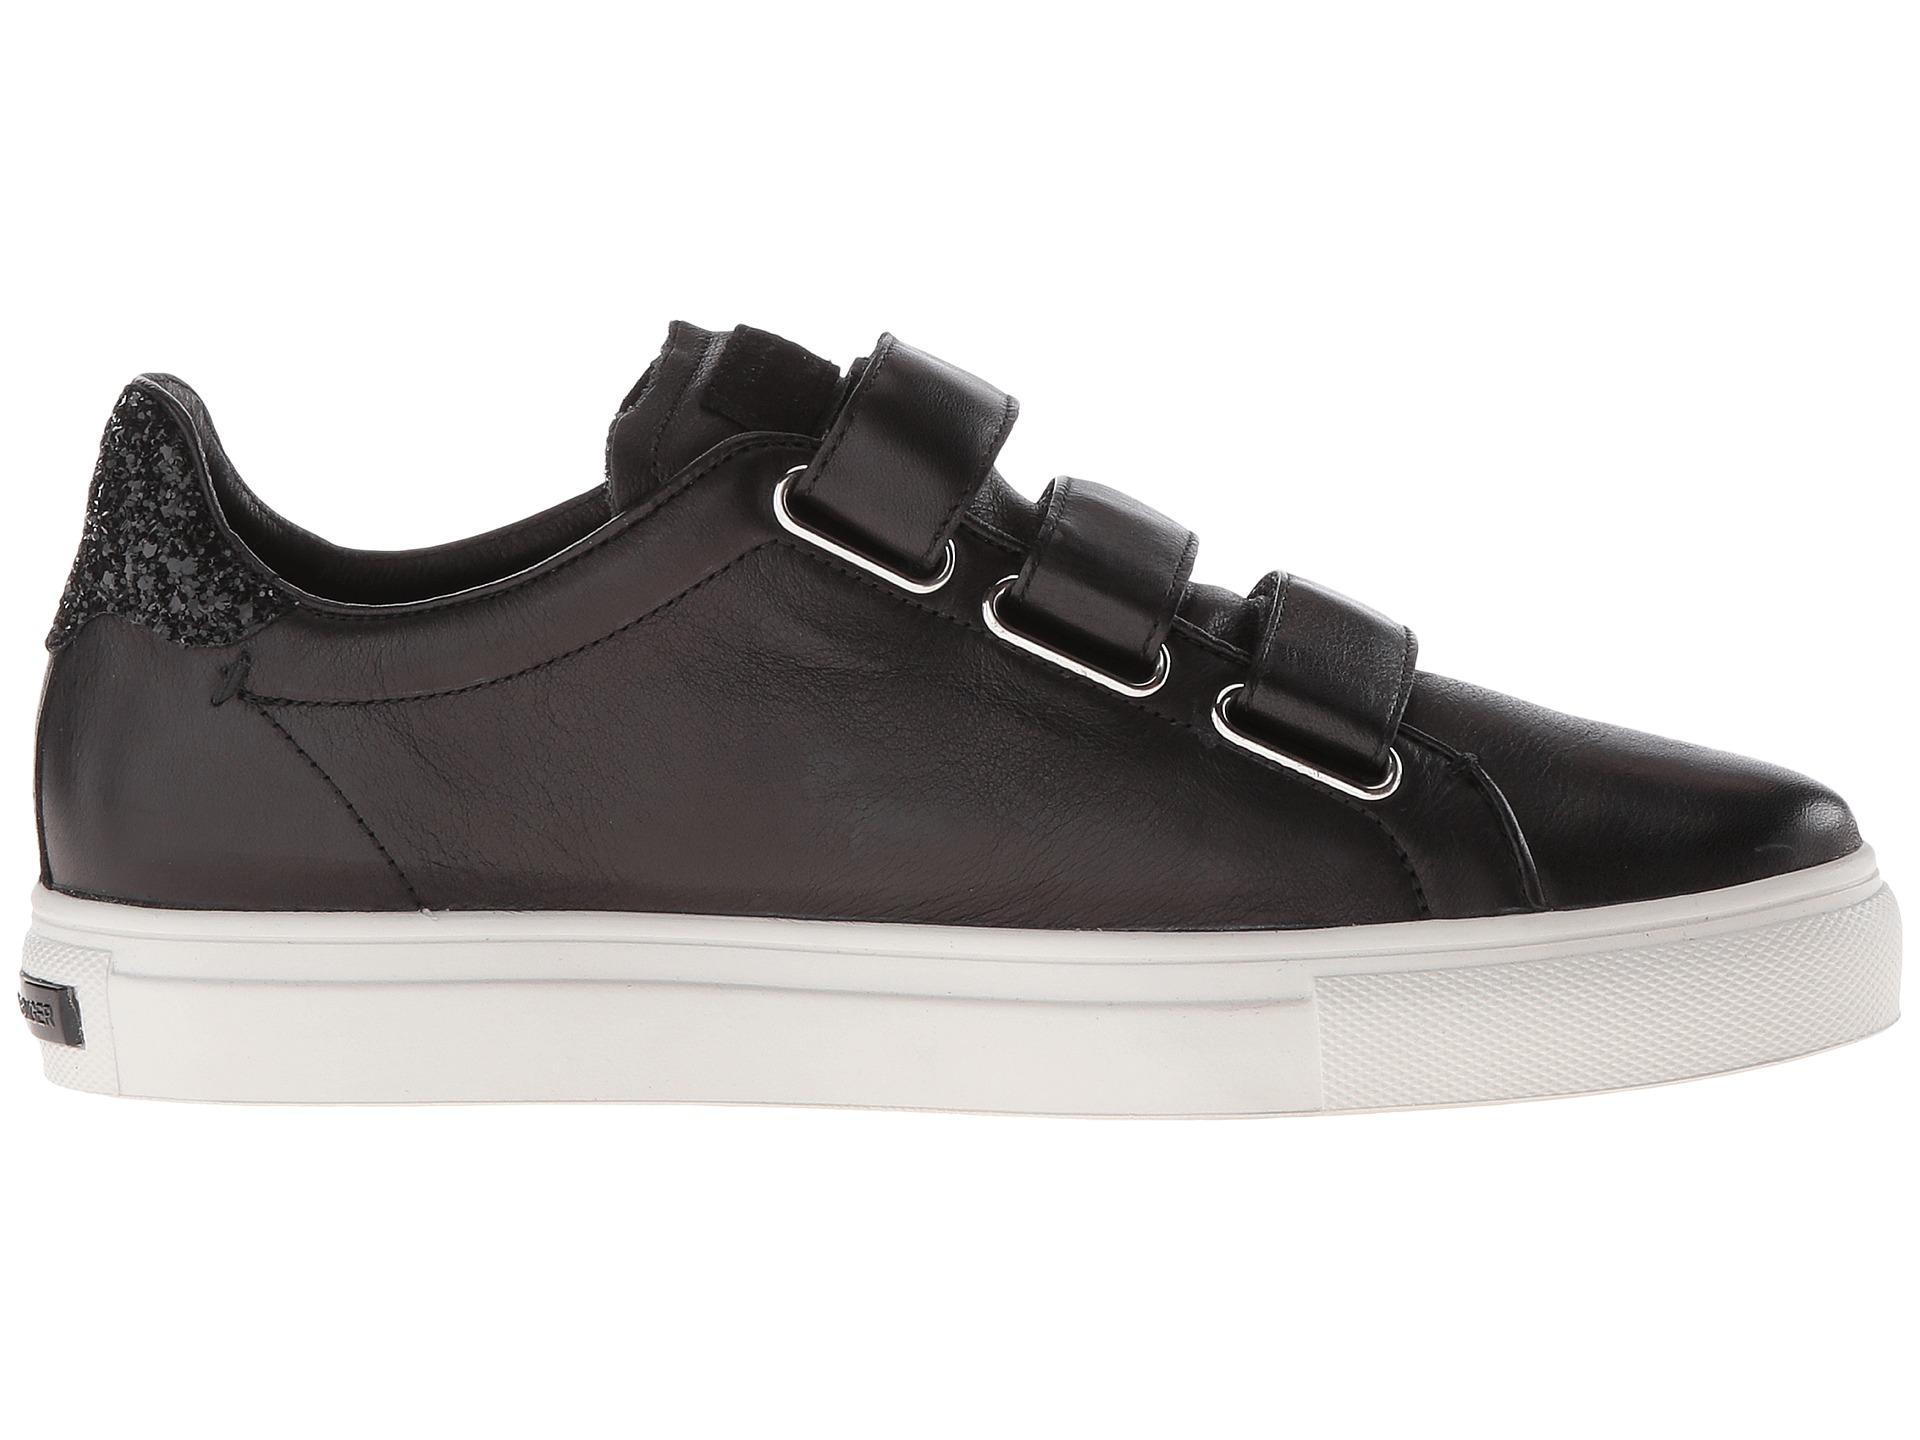 kennel schmenger three strap sneaker black calf glitter. Black Bedroom Furniture Sets. Home Design Ideas